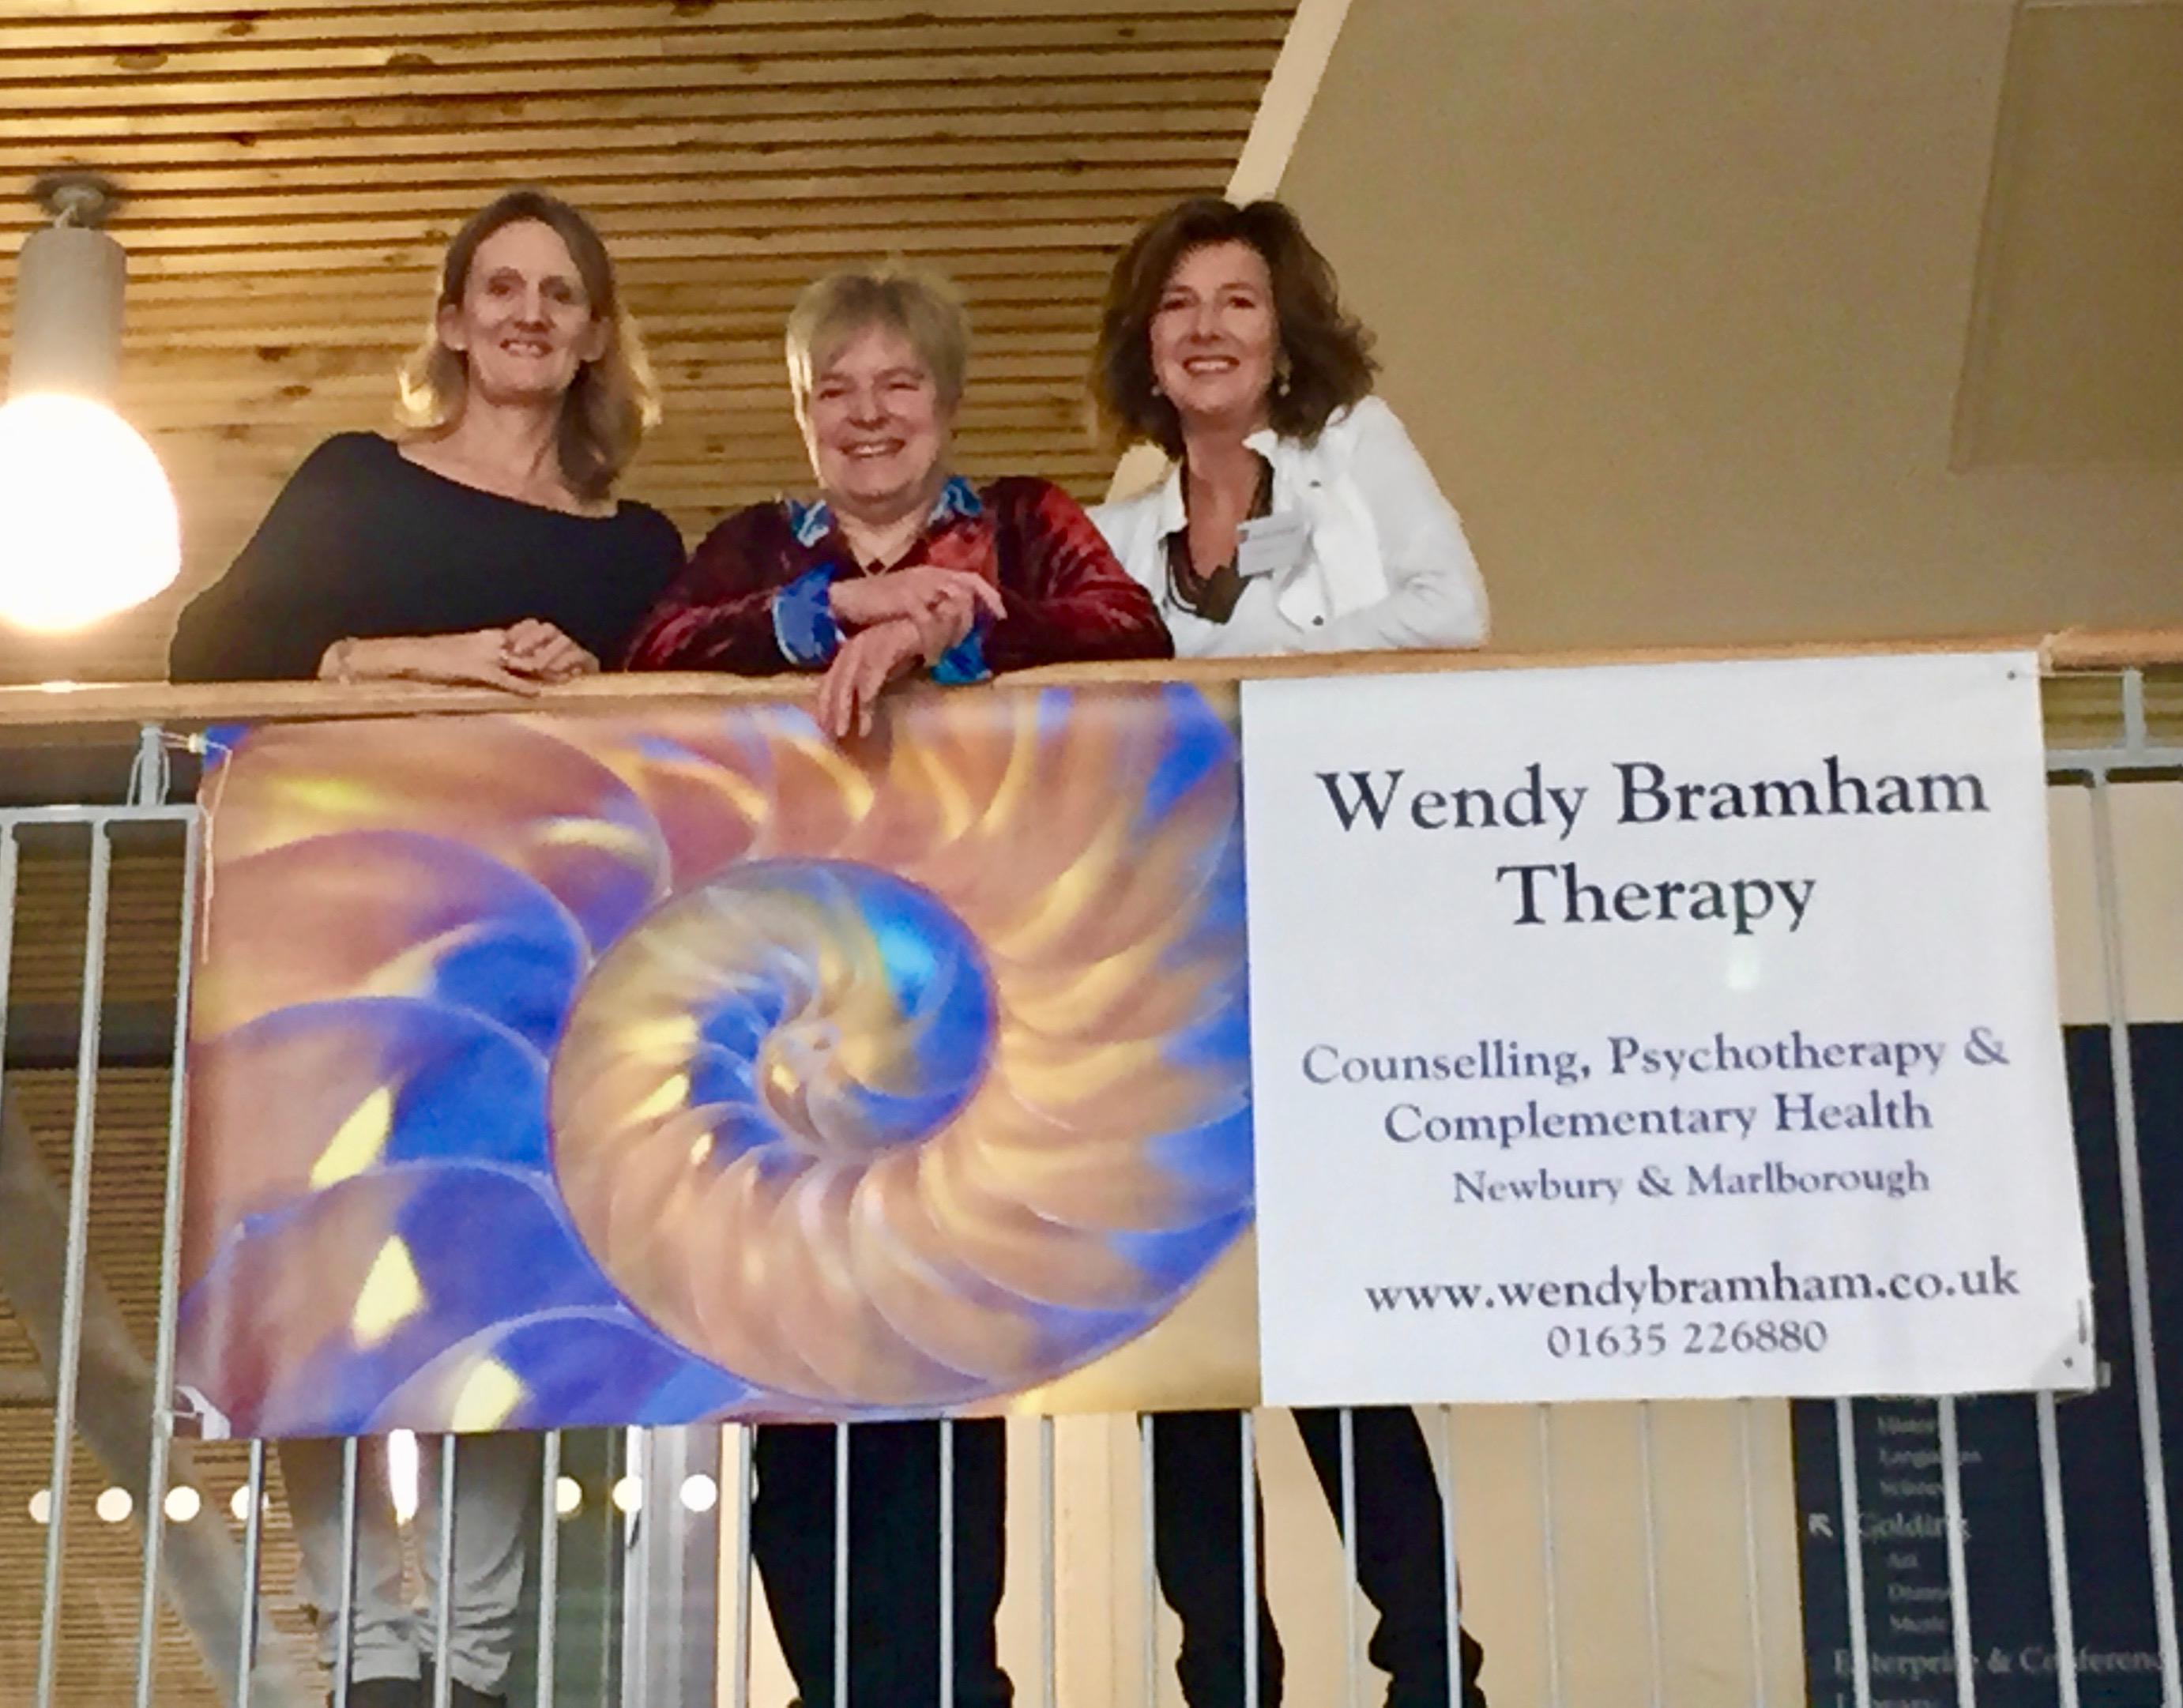 L-R: Briony Martin, Suzie Hayman, Wendy Bramham